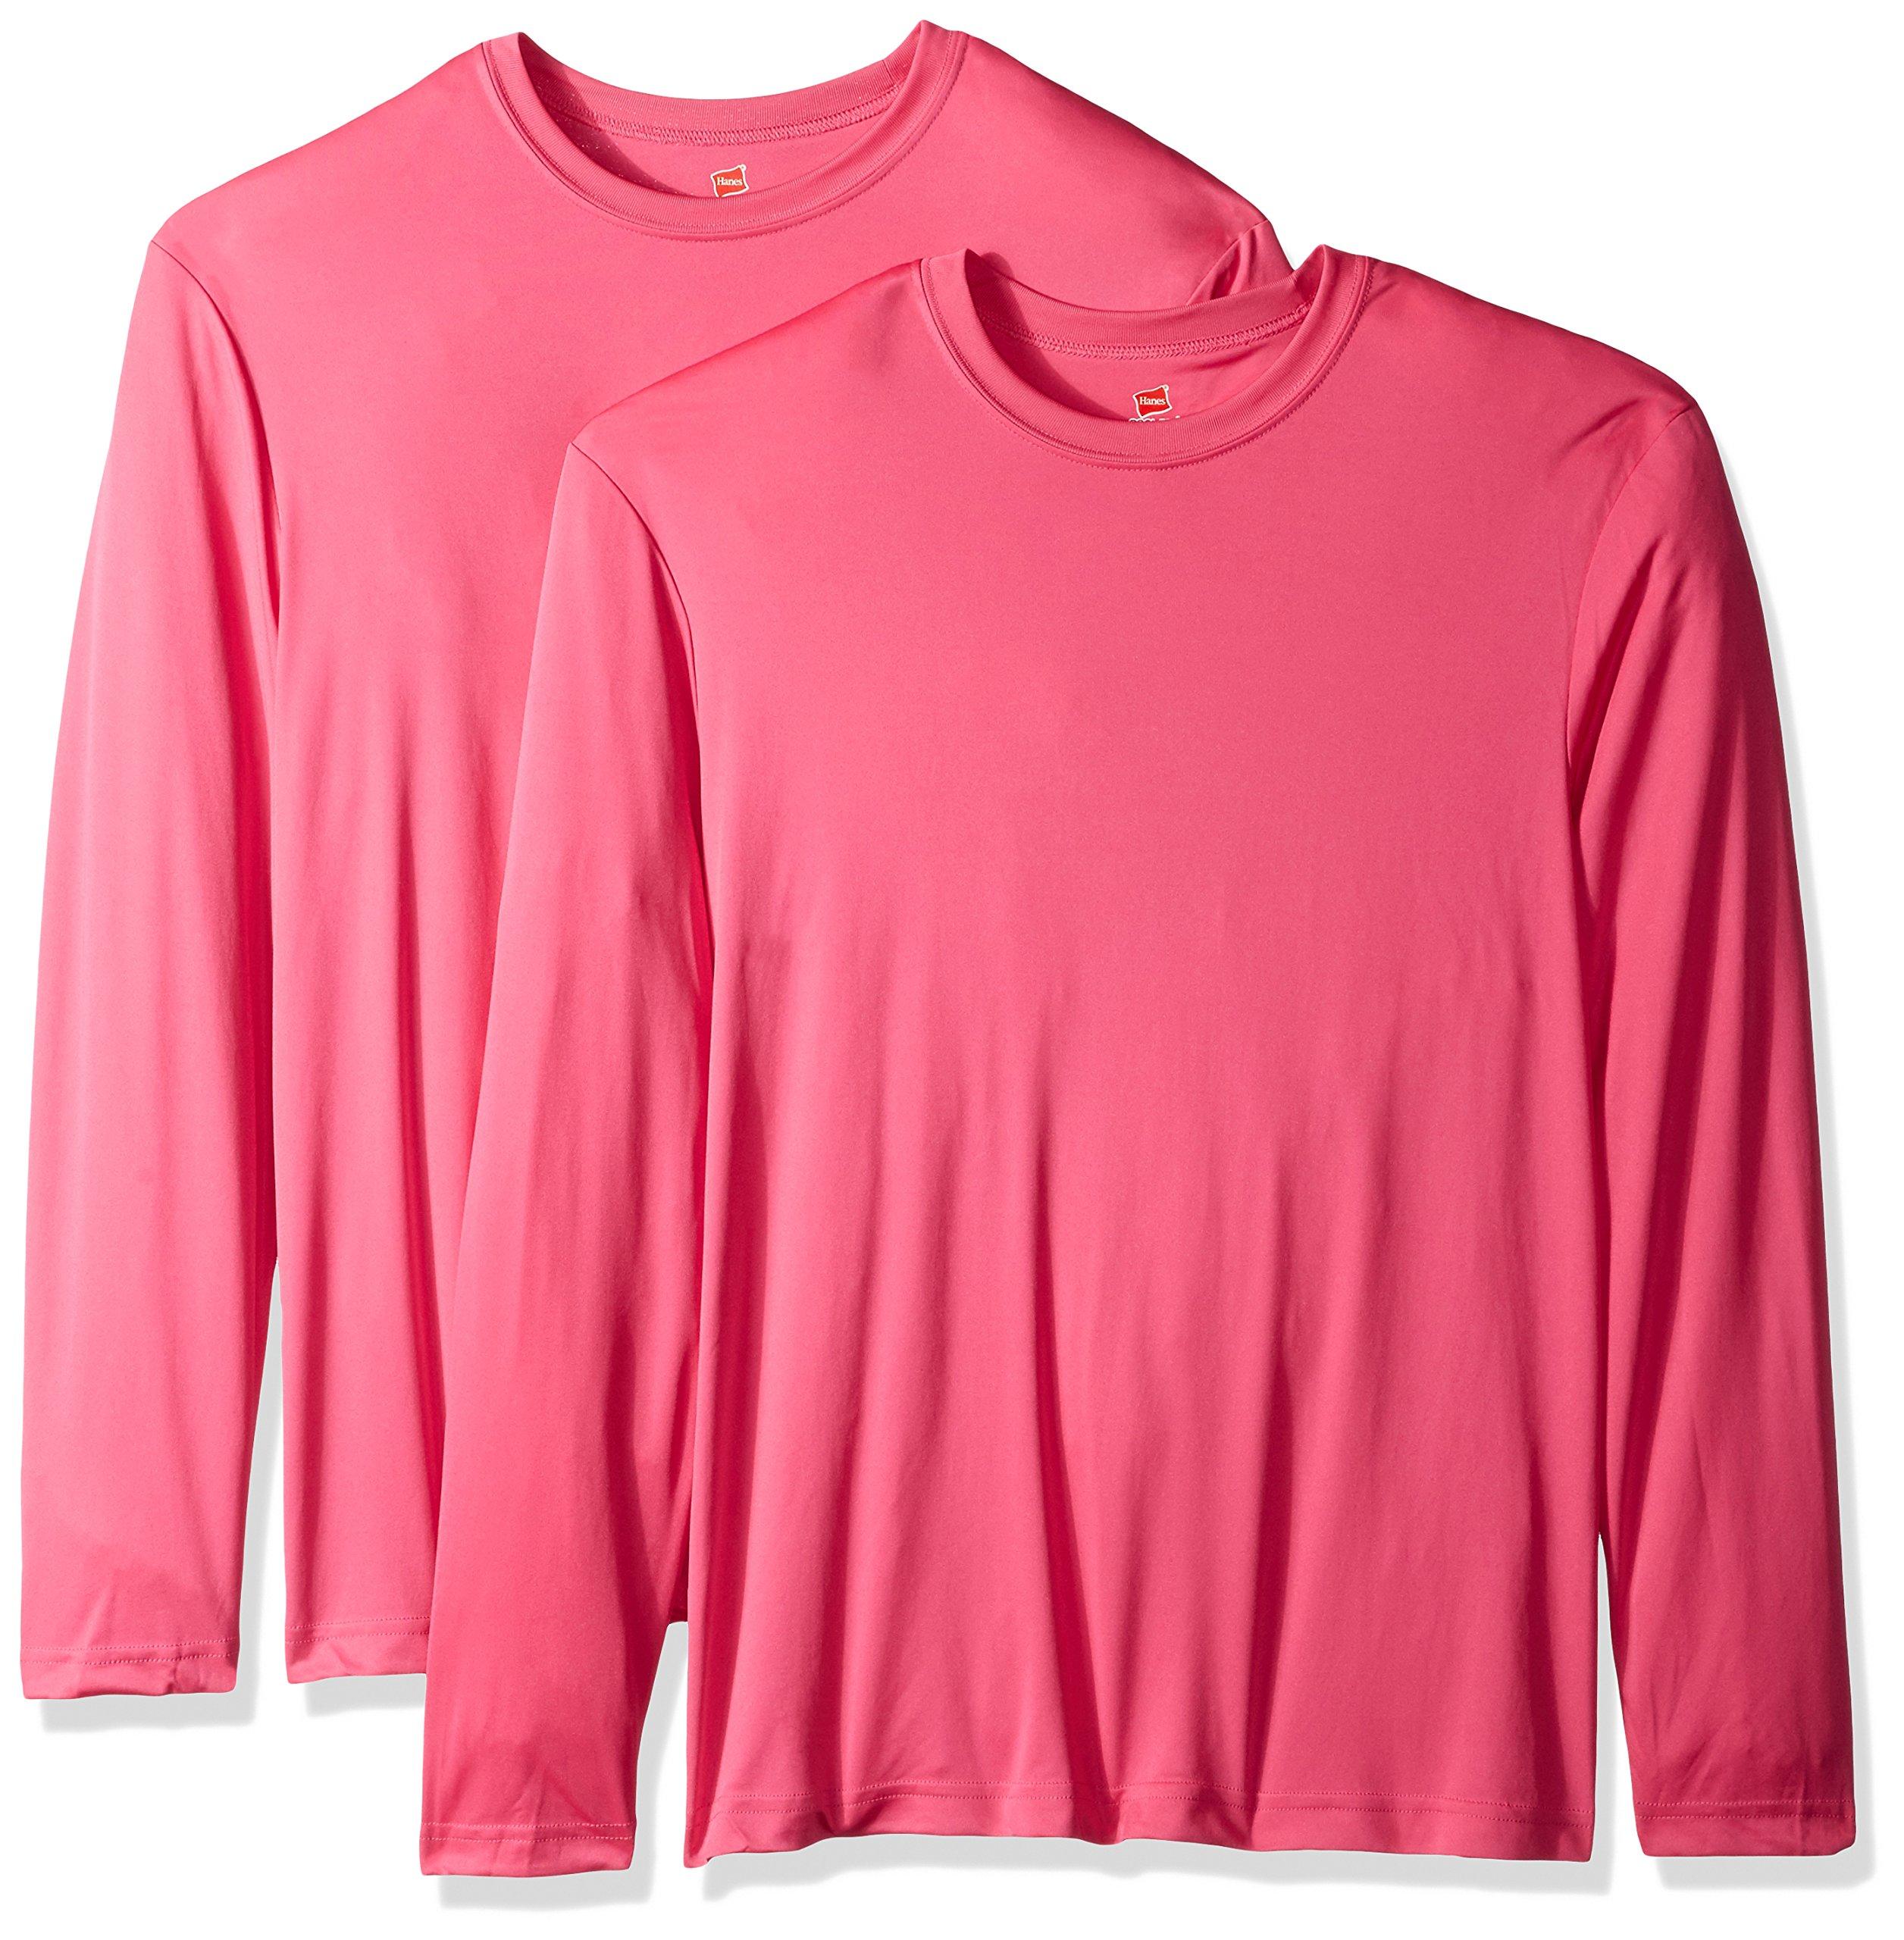 Hanes Men's Long Sleeve Cool DRI T-Shirt UPF 50+ (Pack of 2), Wow Pink, 3XL